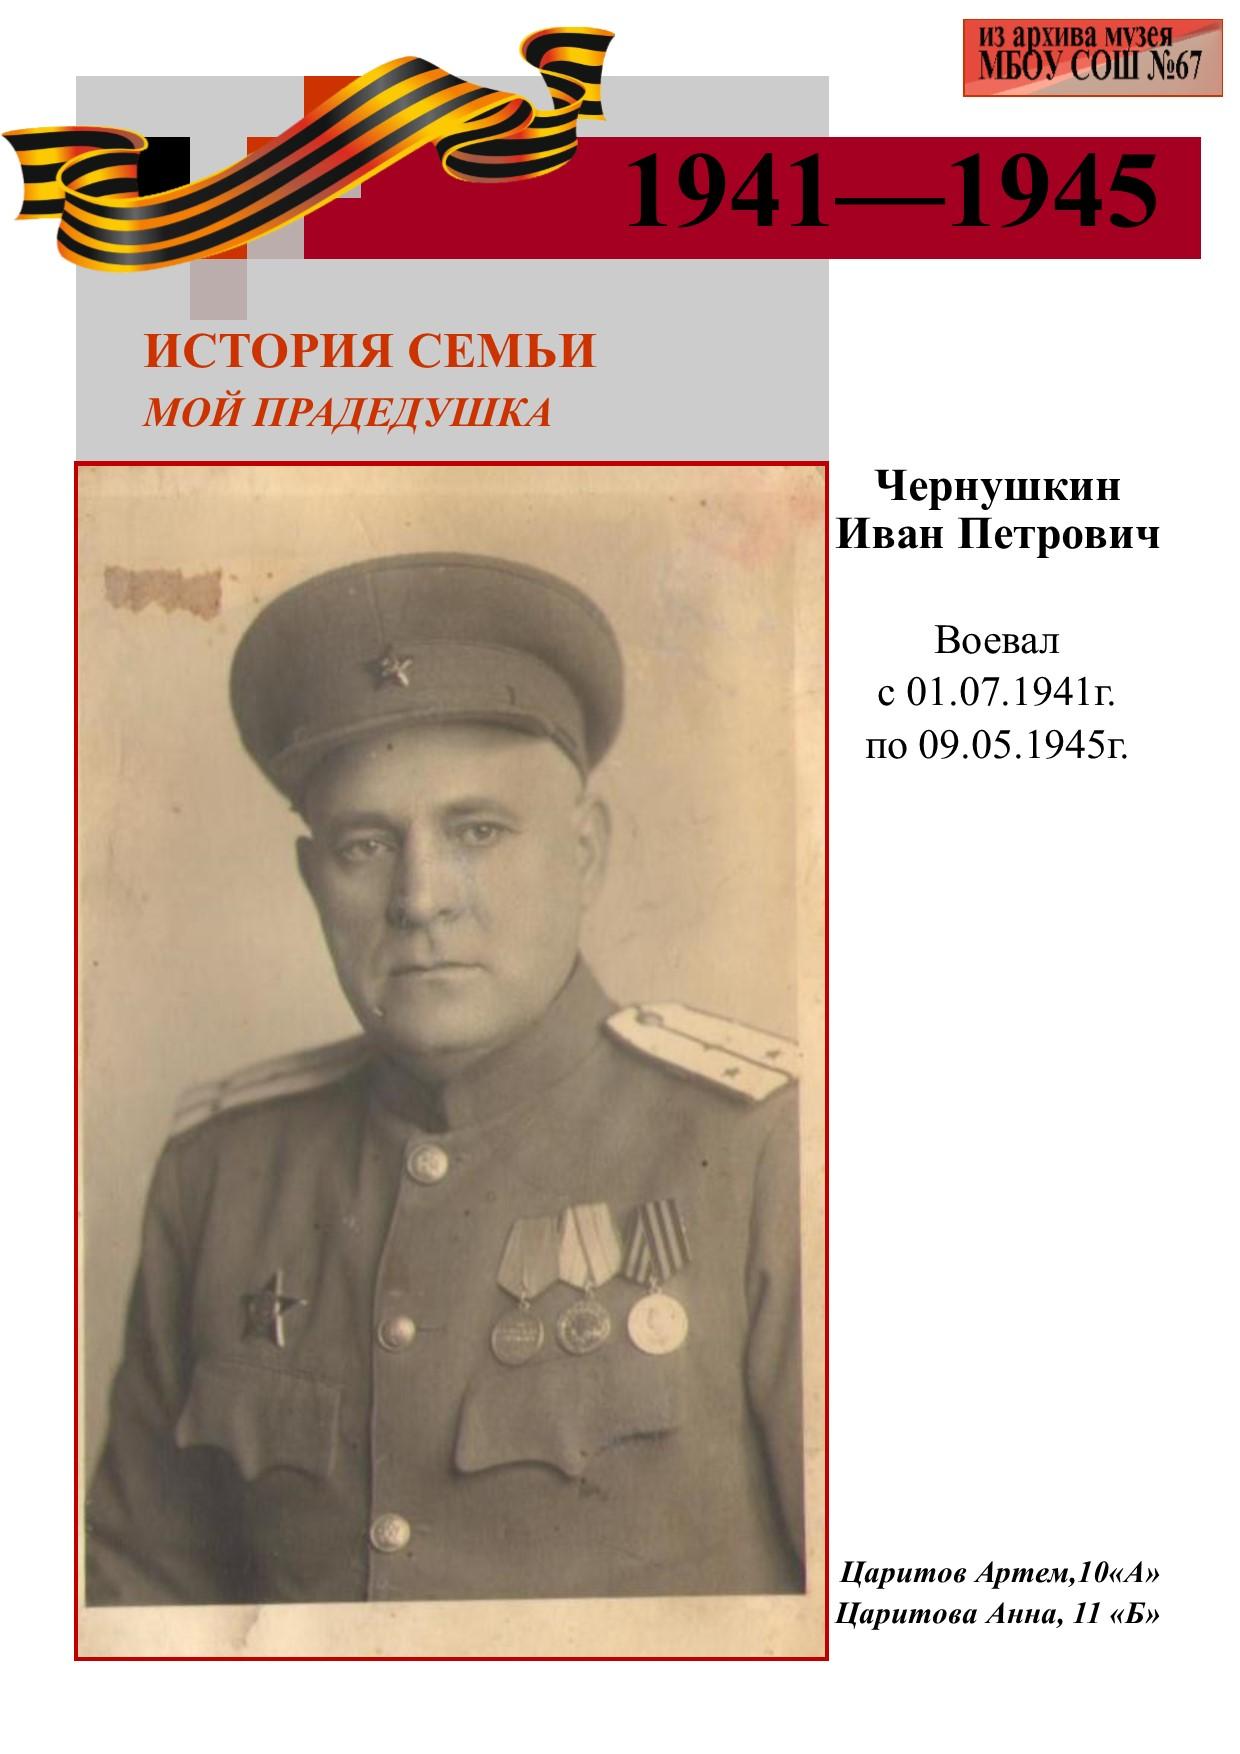 Царитов — Чернушкин